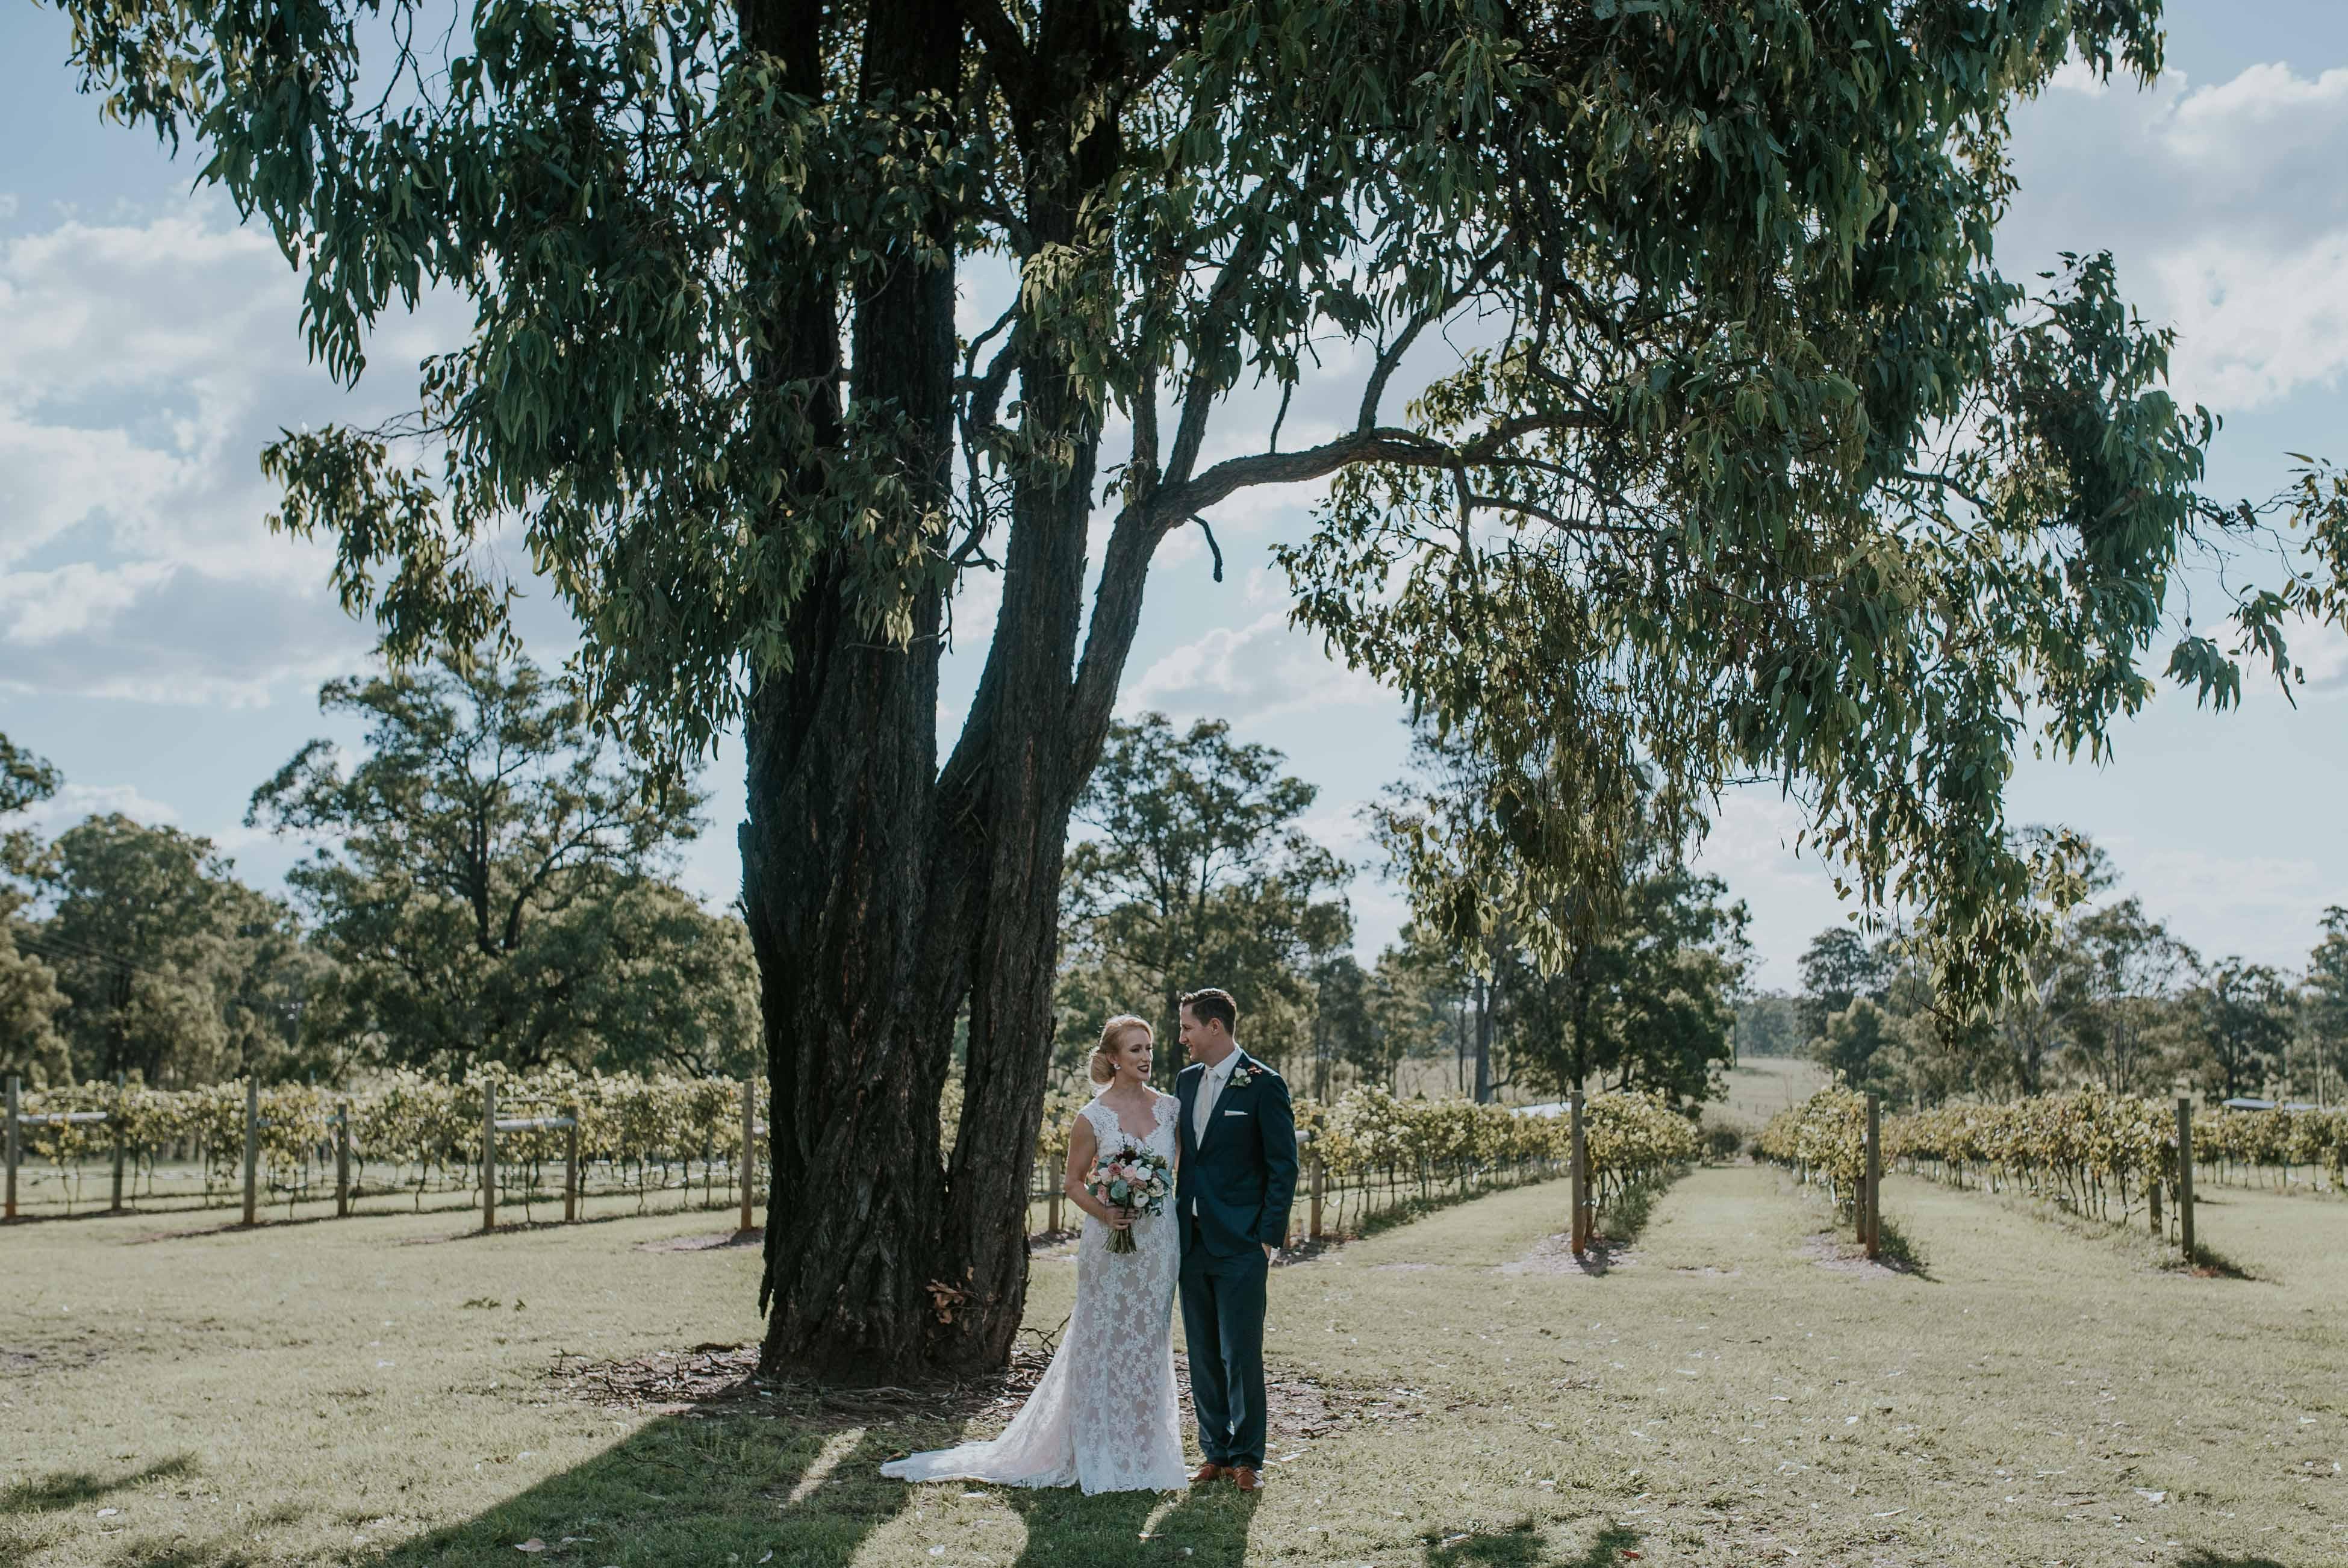 Sam + Erin | 01/04/2017 | Hunter Valley Wedding Video | Pokolbin, Hunter Valley, NSW